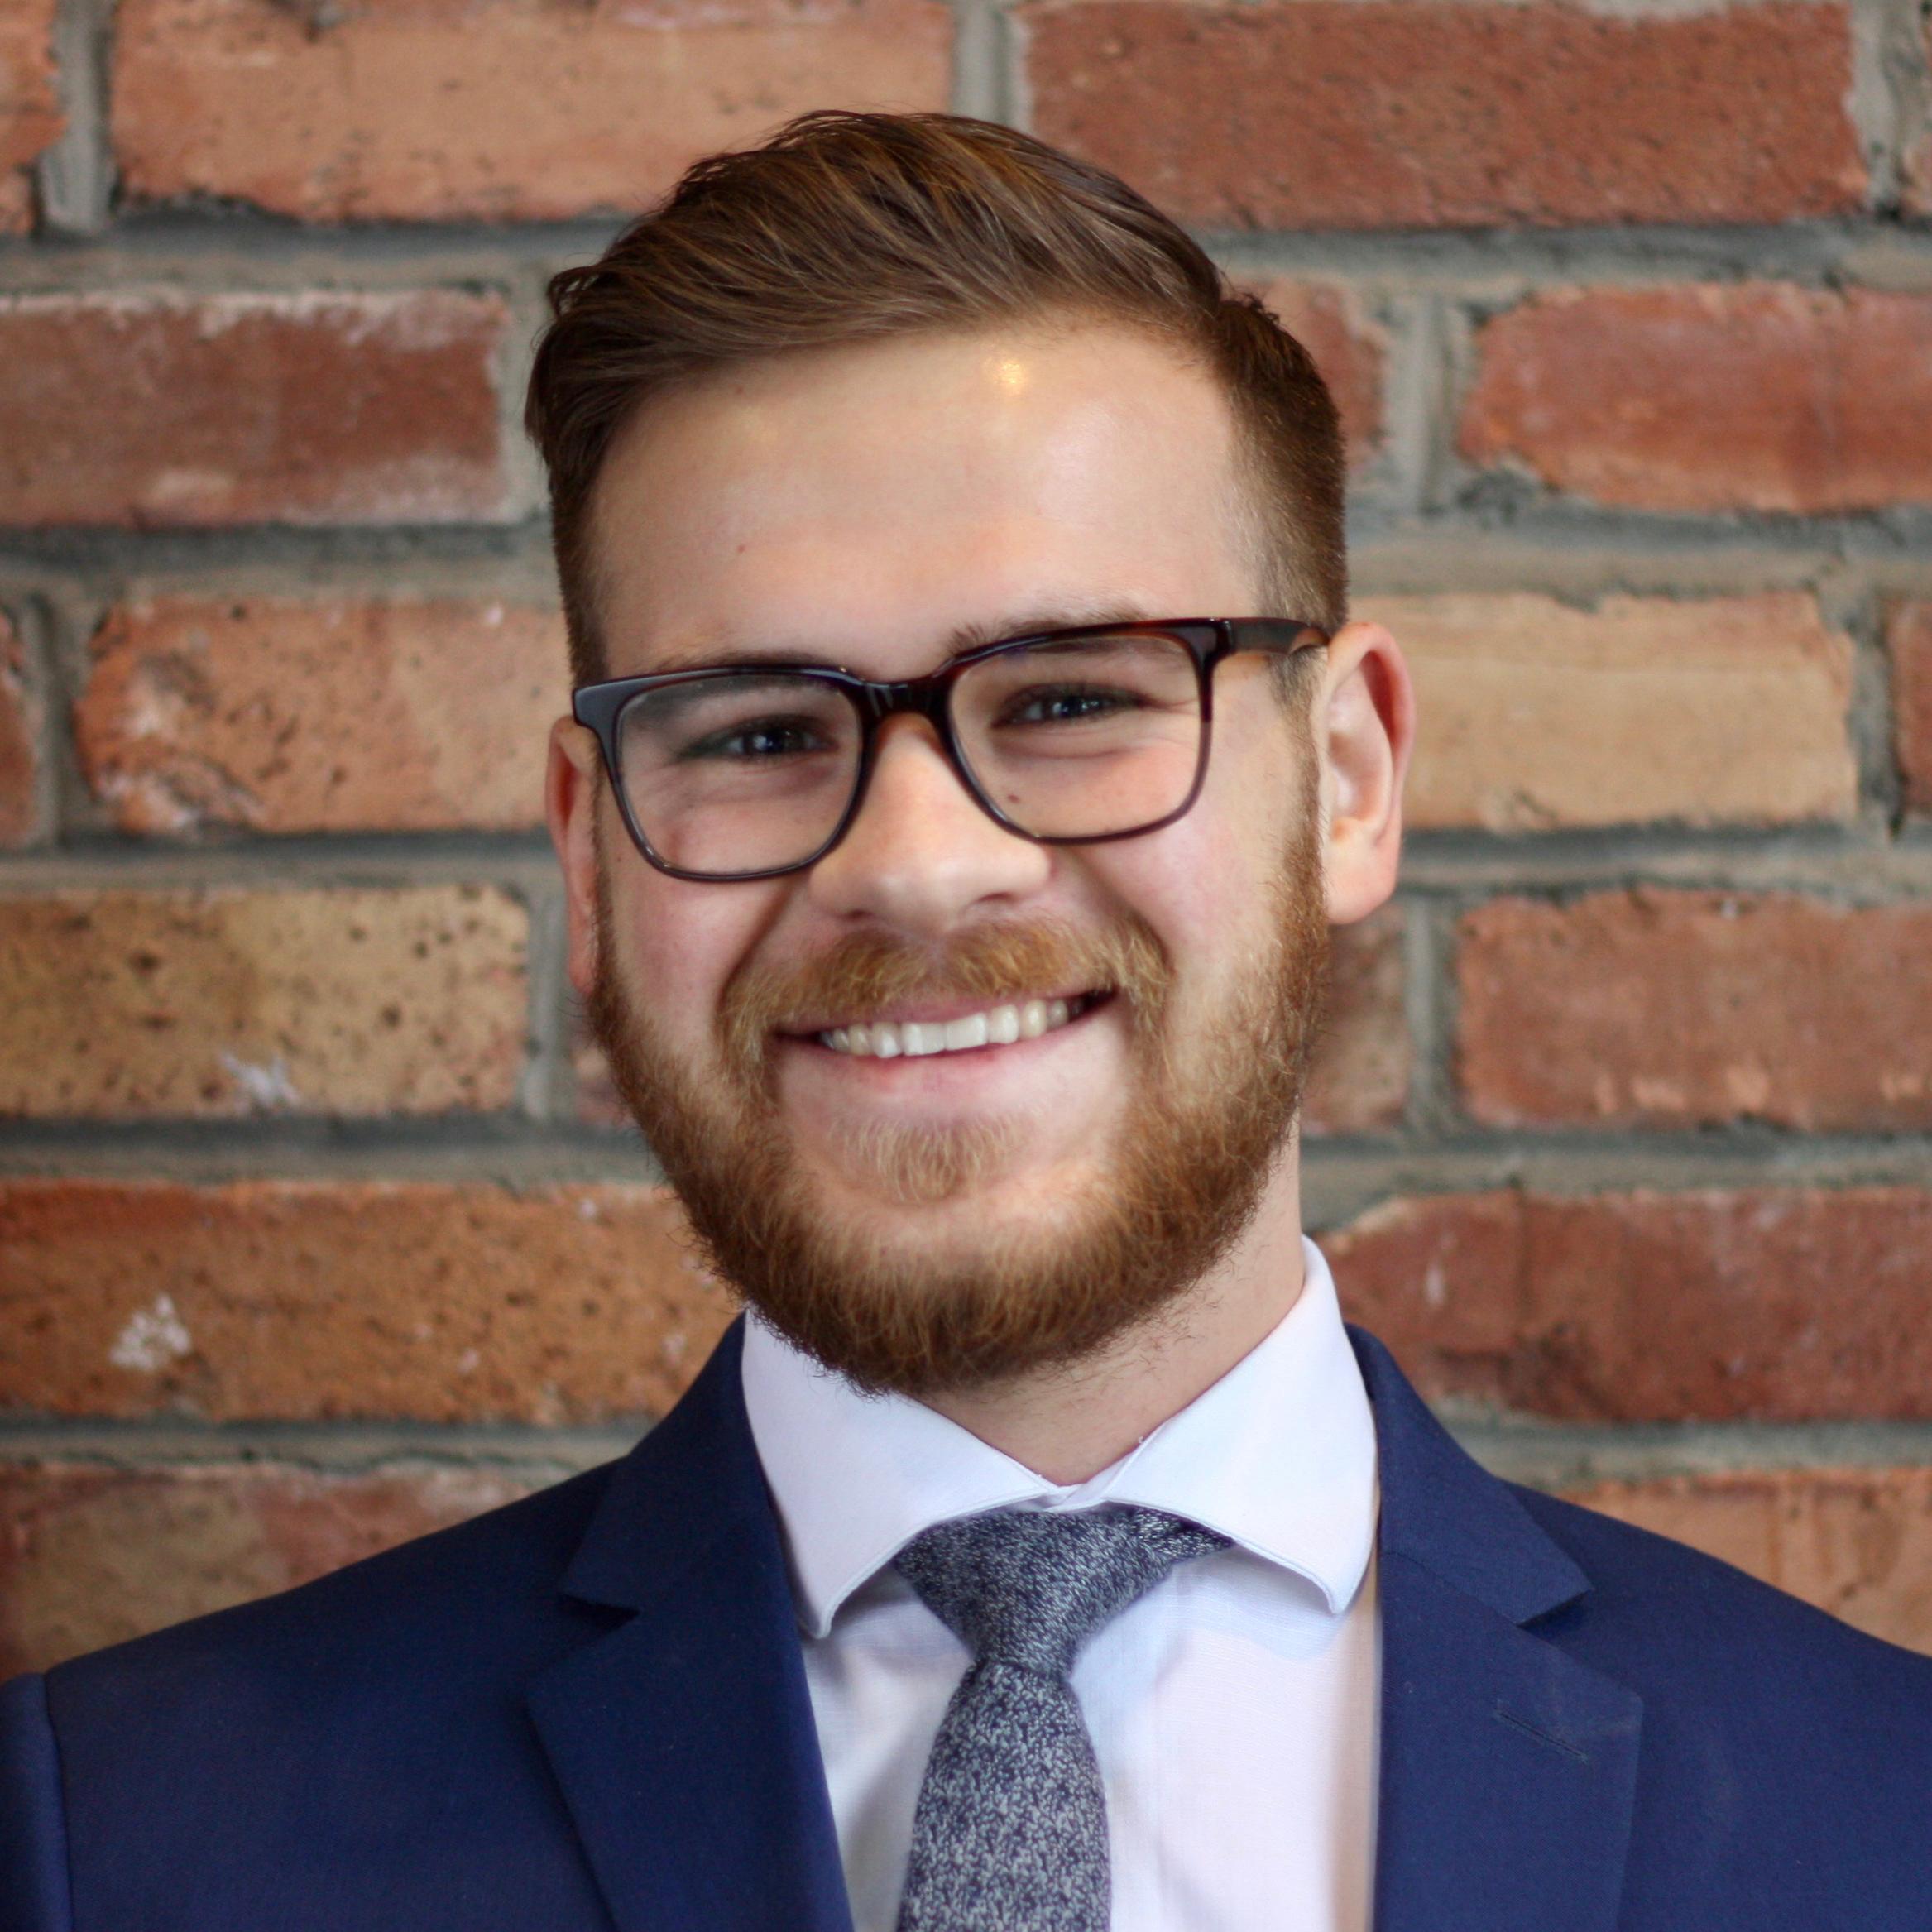 Ryan Josefchak   Custom Sales Manager 1-877-795-5678 x 821  Email